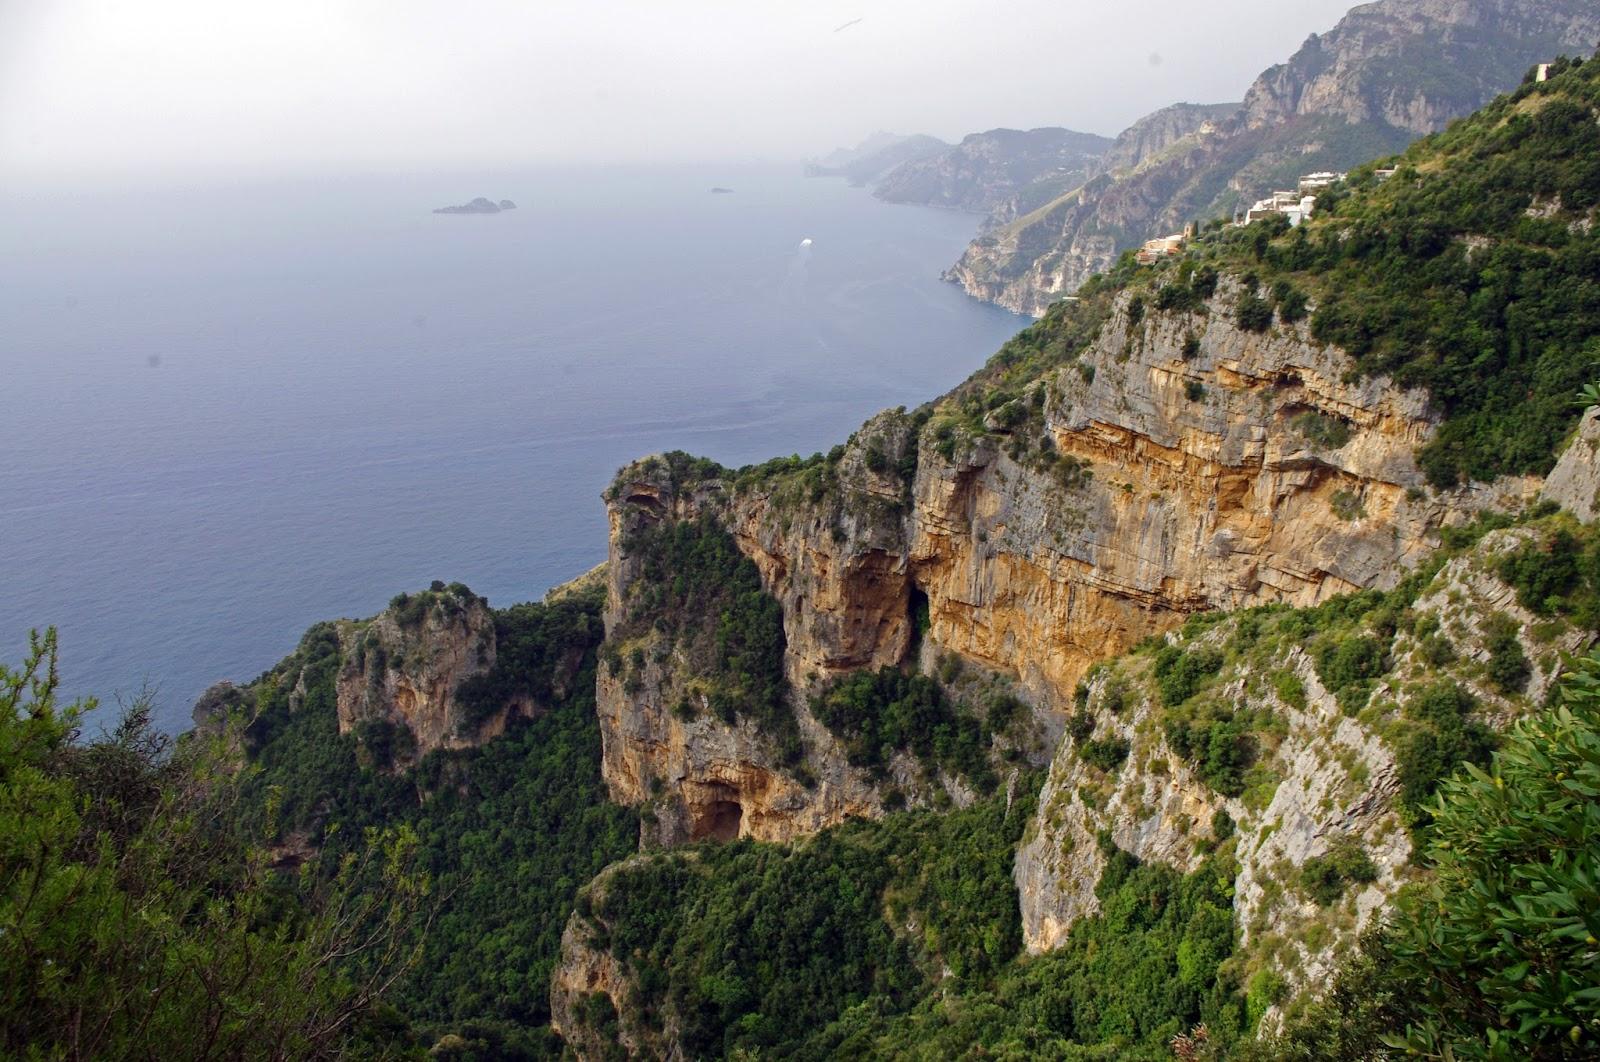 Views of Amalfi Coast from Walk of the Gods